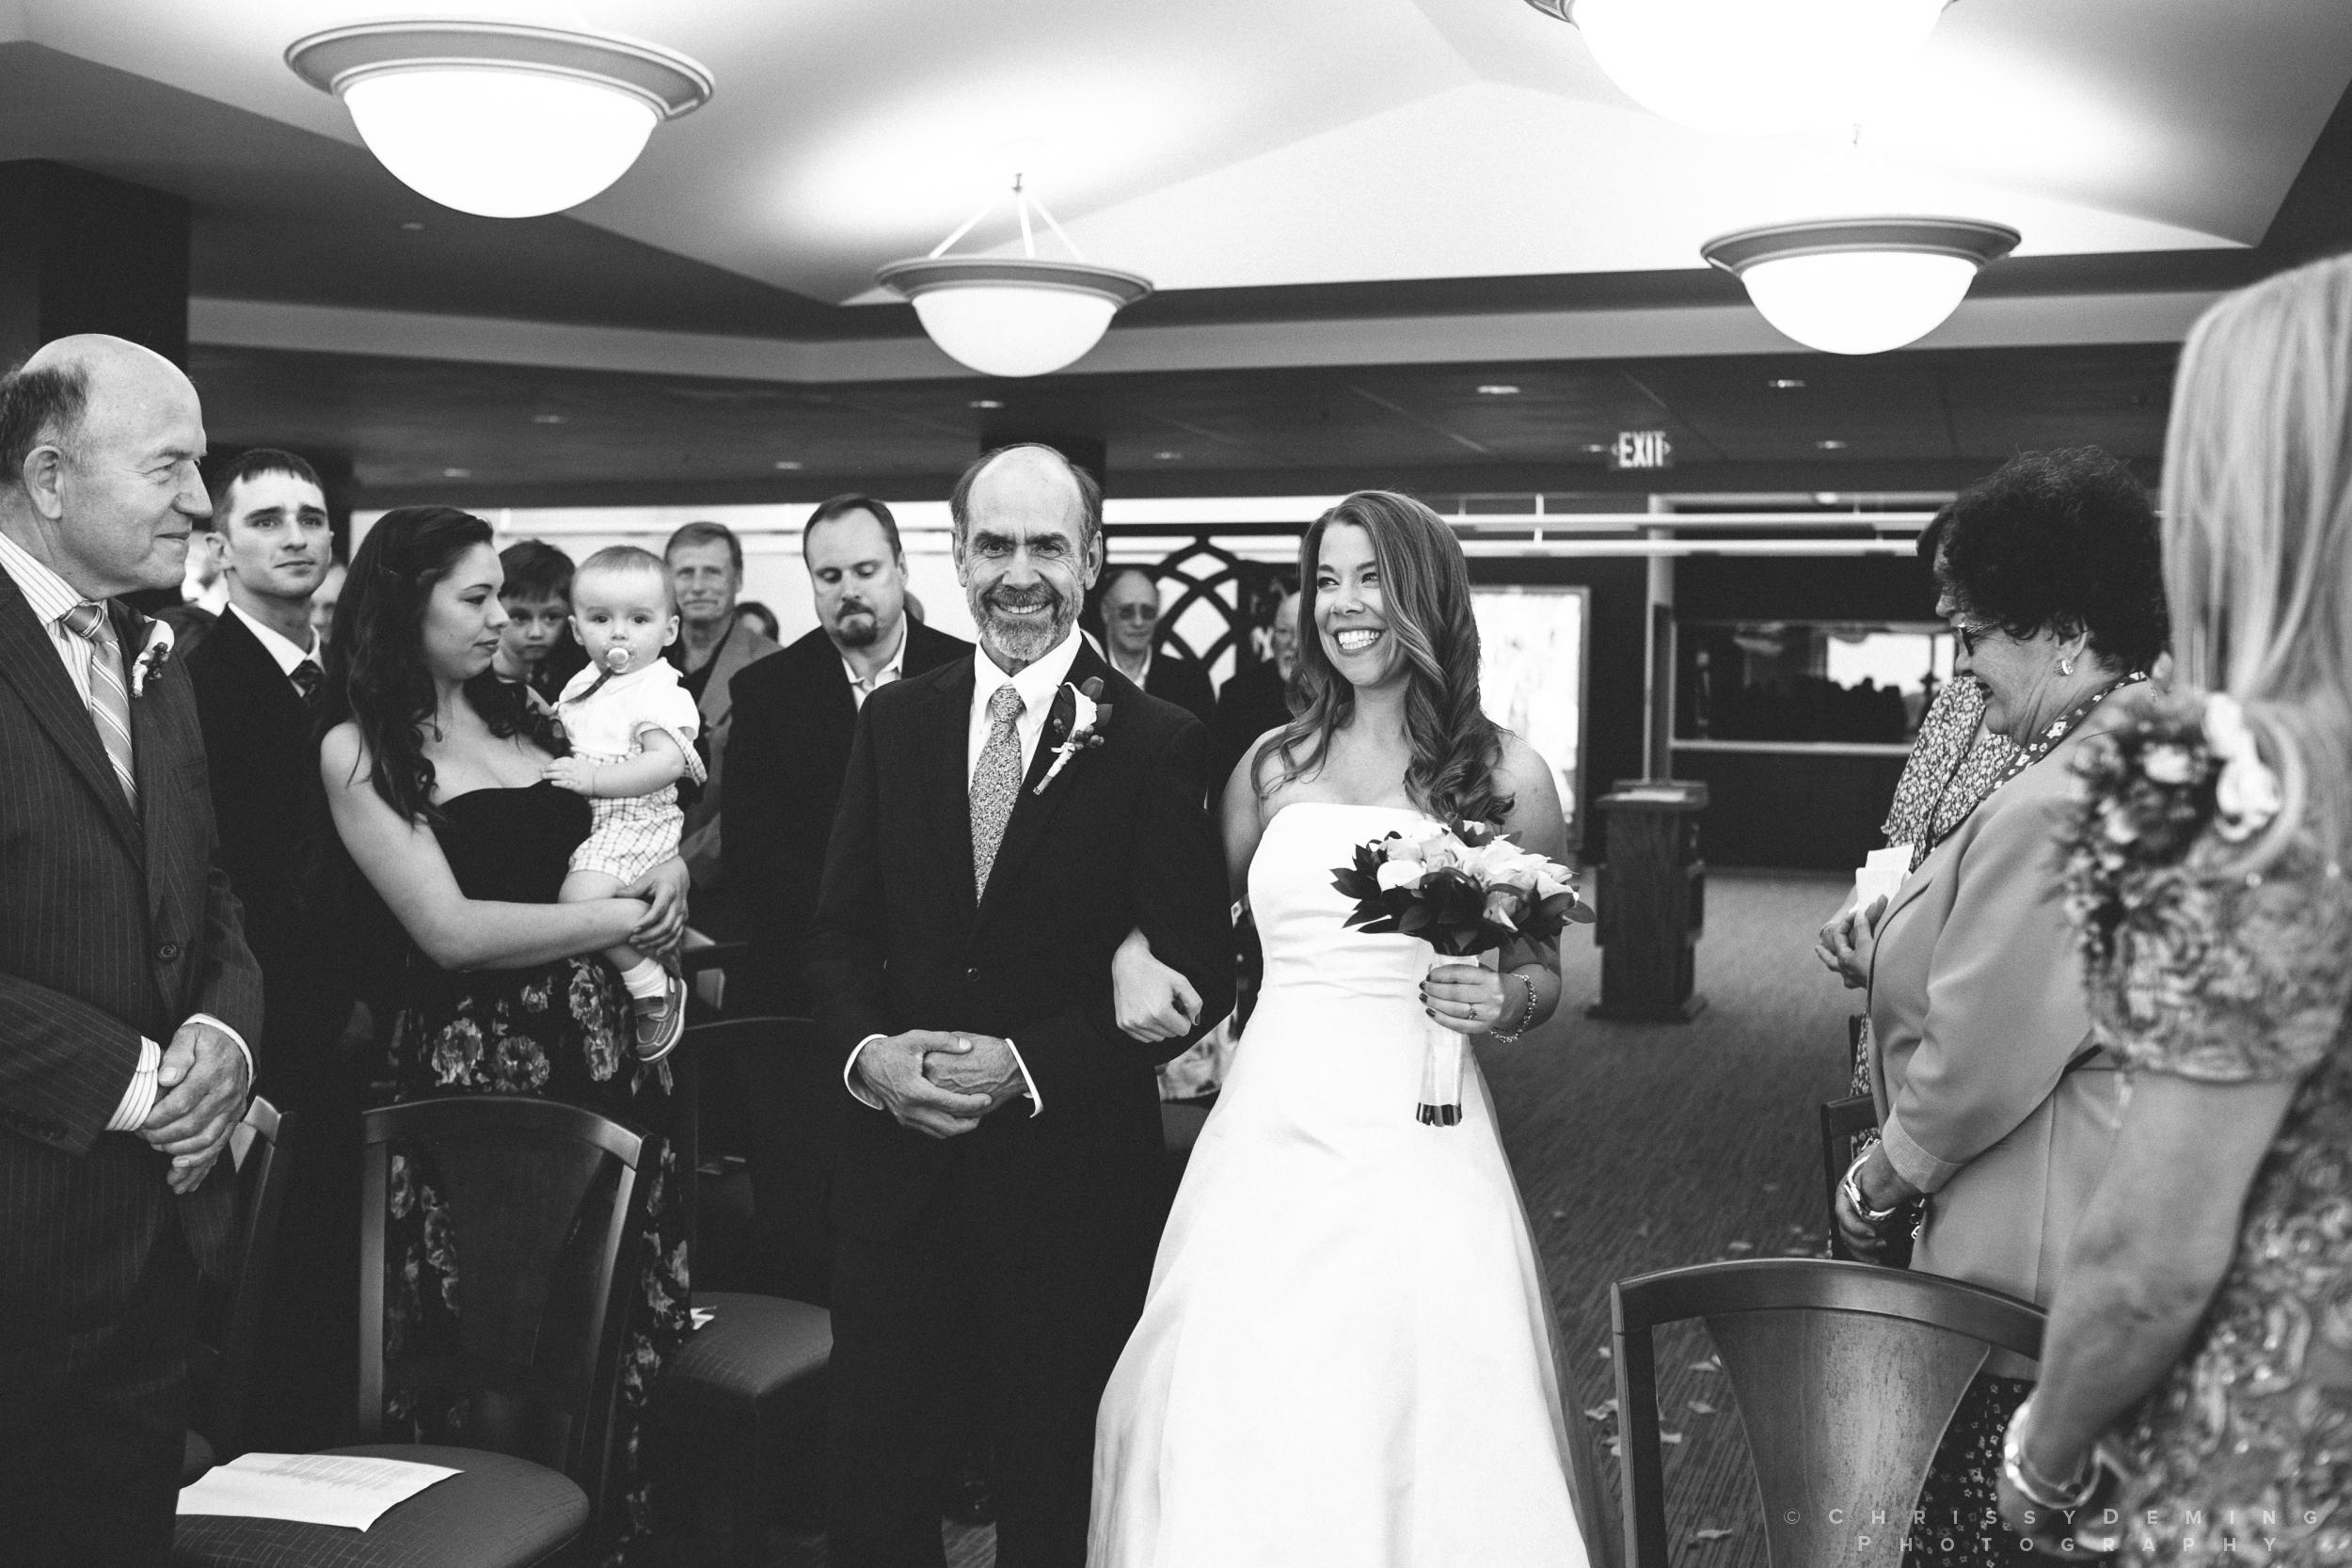 benedictine_lisle_wedding_photographer_0023.jpg